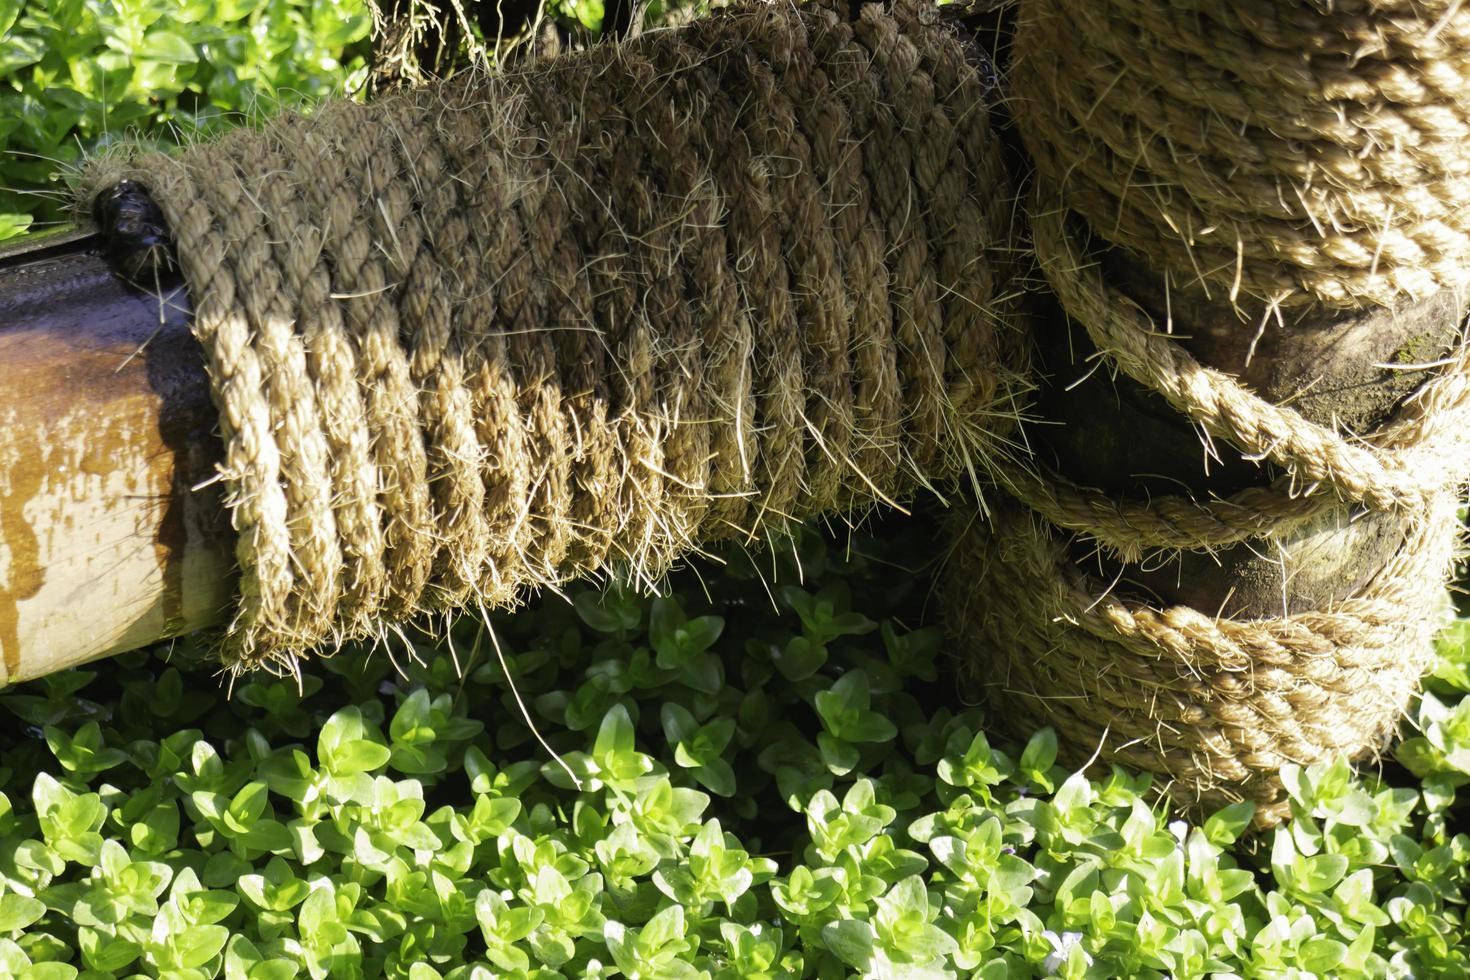 touw in de tuin foto